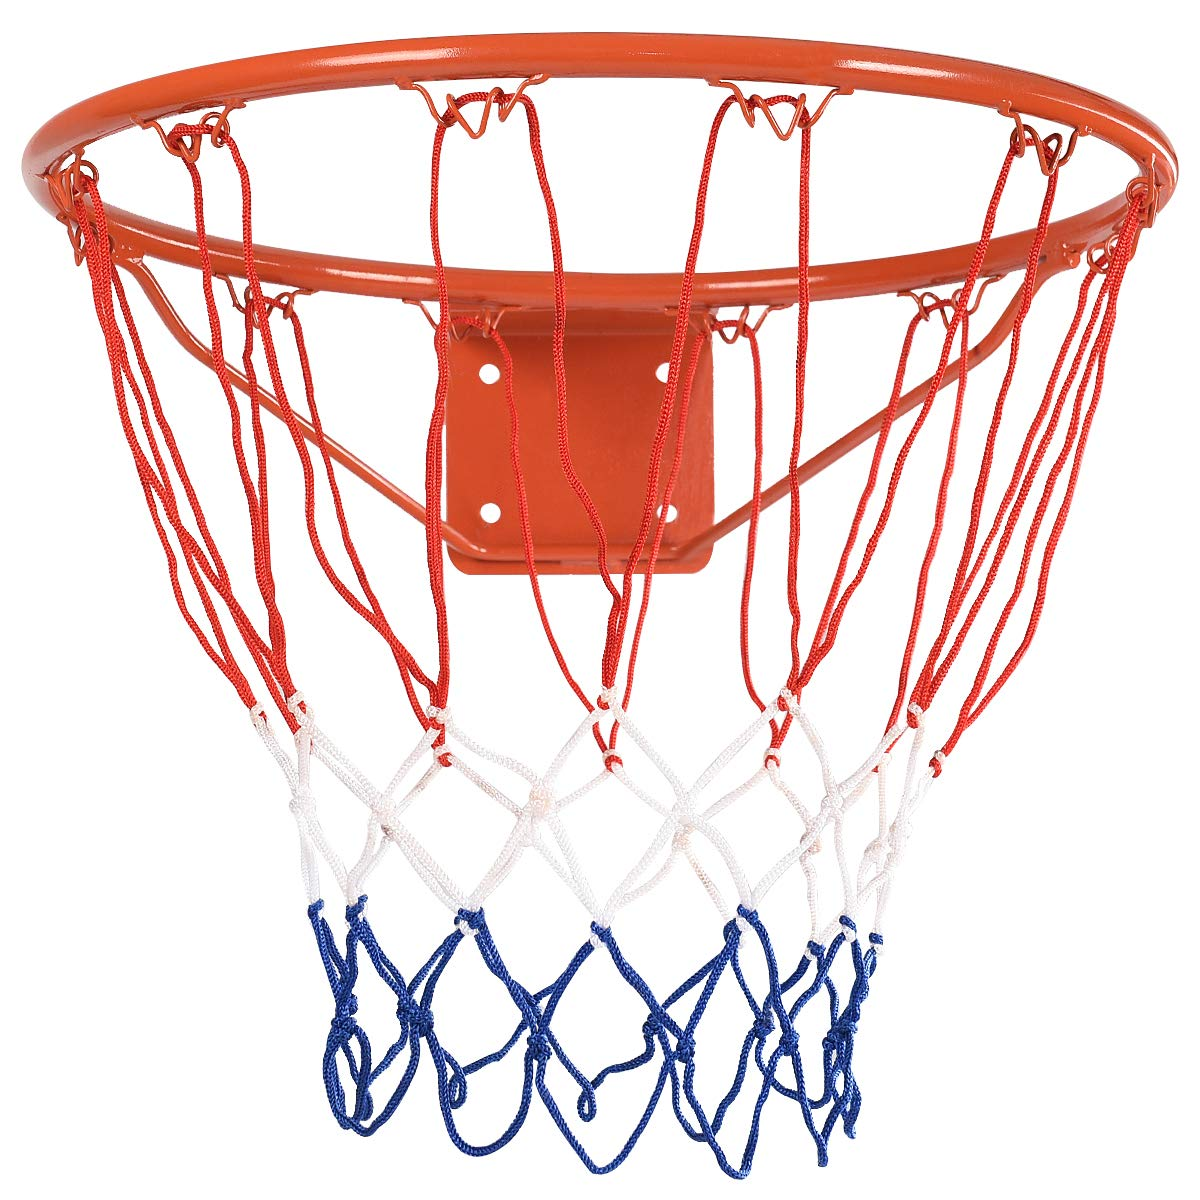 amazon gymax basketball rim 18 wall door mounted basketball I-Beam Wood amazon gymax basketball rim 18 wall door mounted basketball rim goal net basketball hoop for indoor outdoor sports outdoors